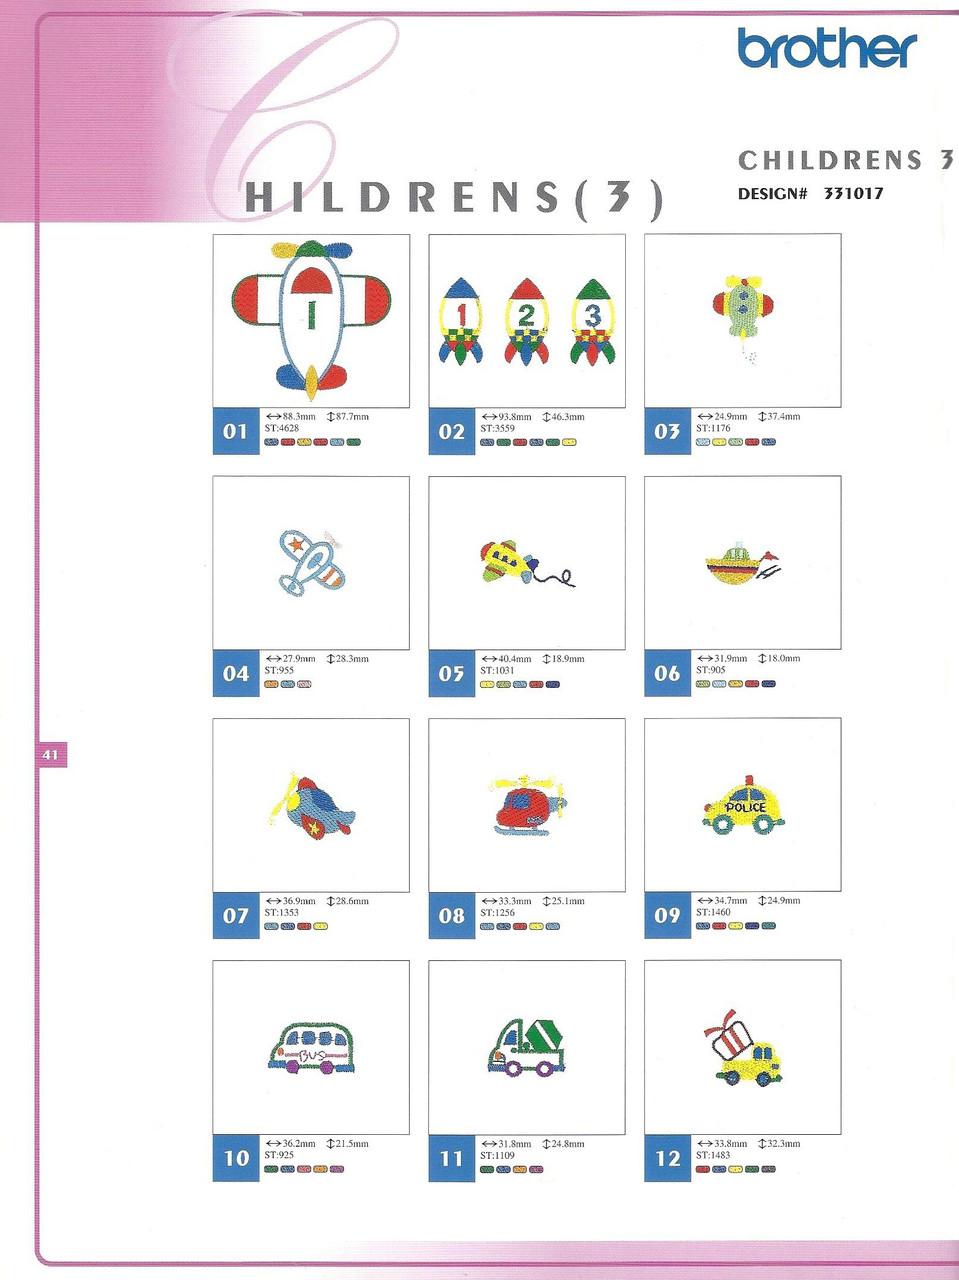 331017 Childrens III